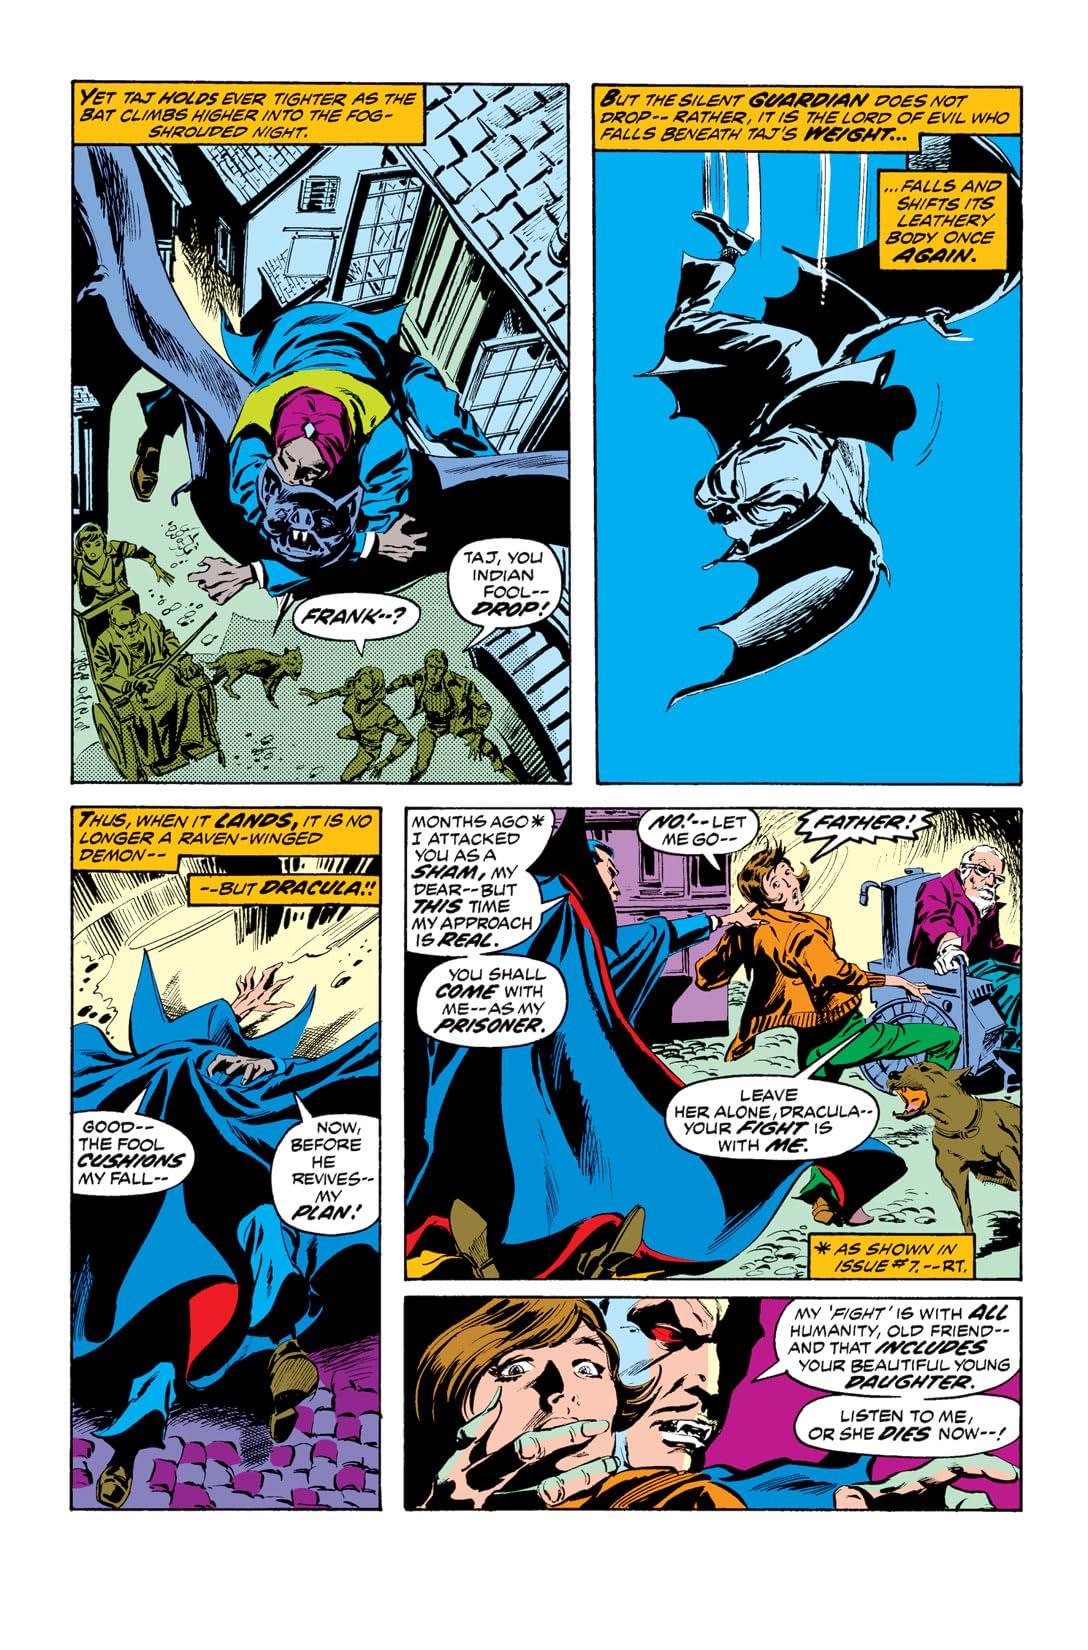 Tomb of Dracula (1972-1979) #12